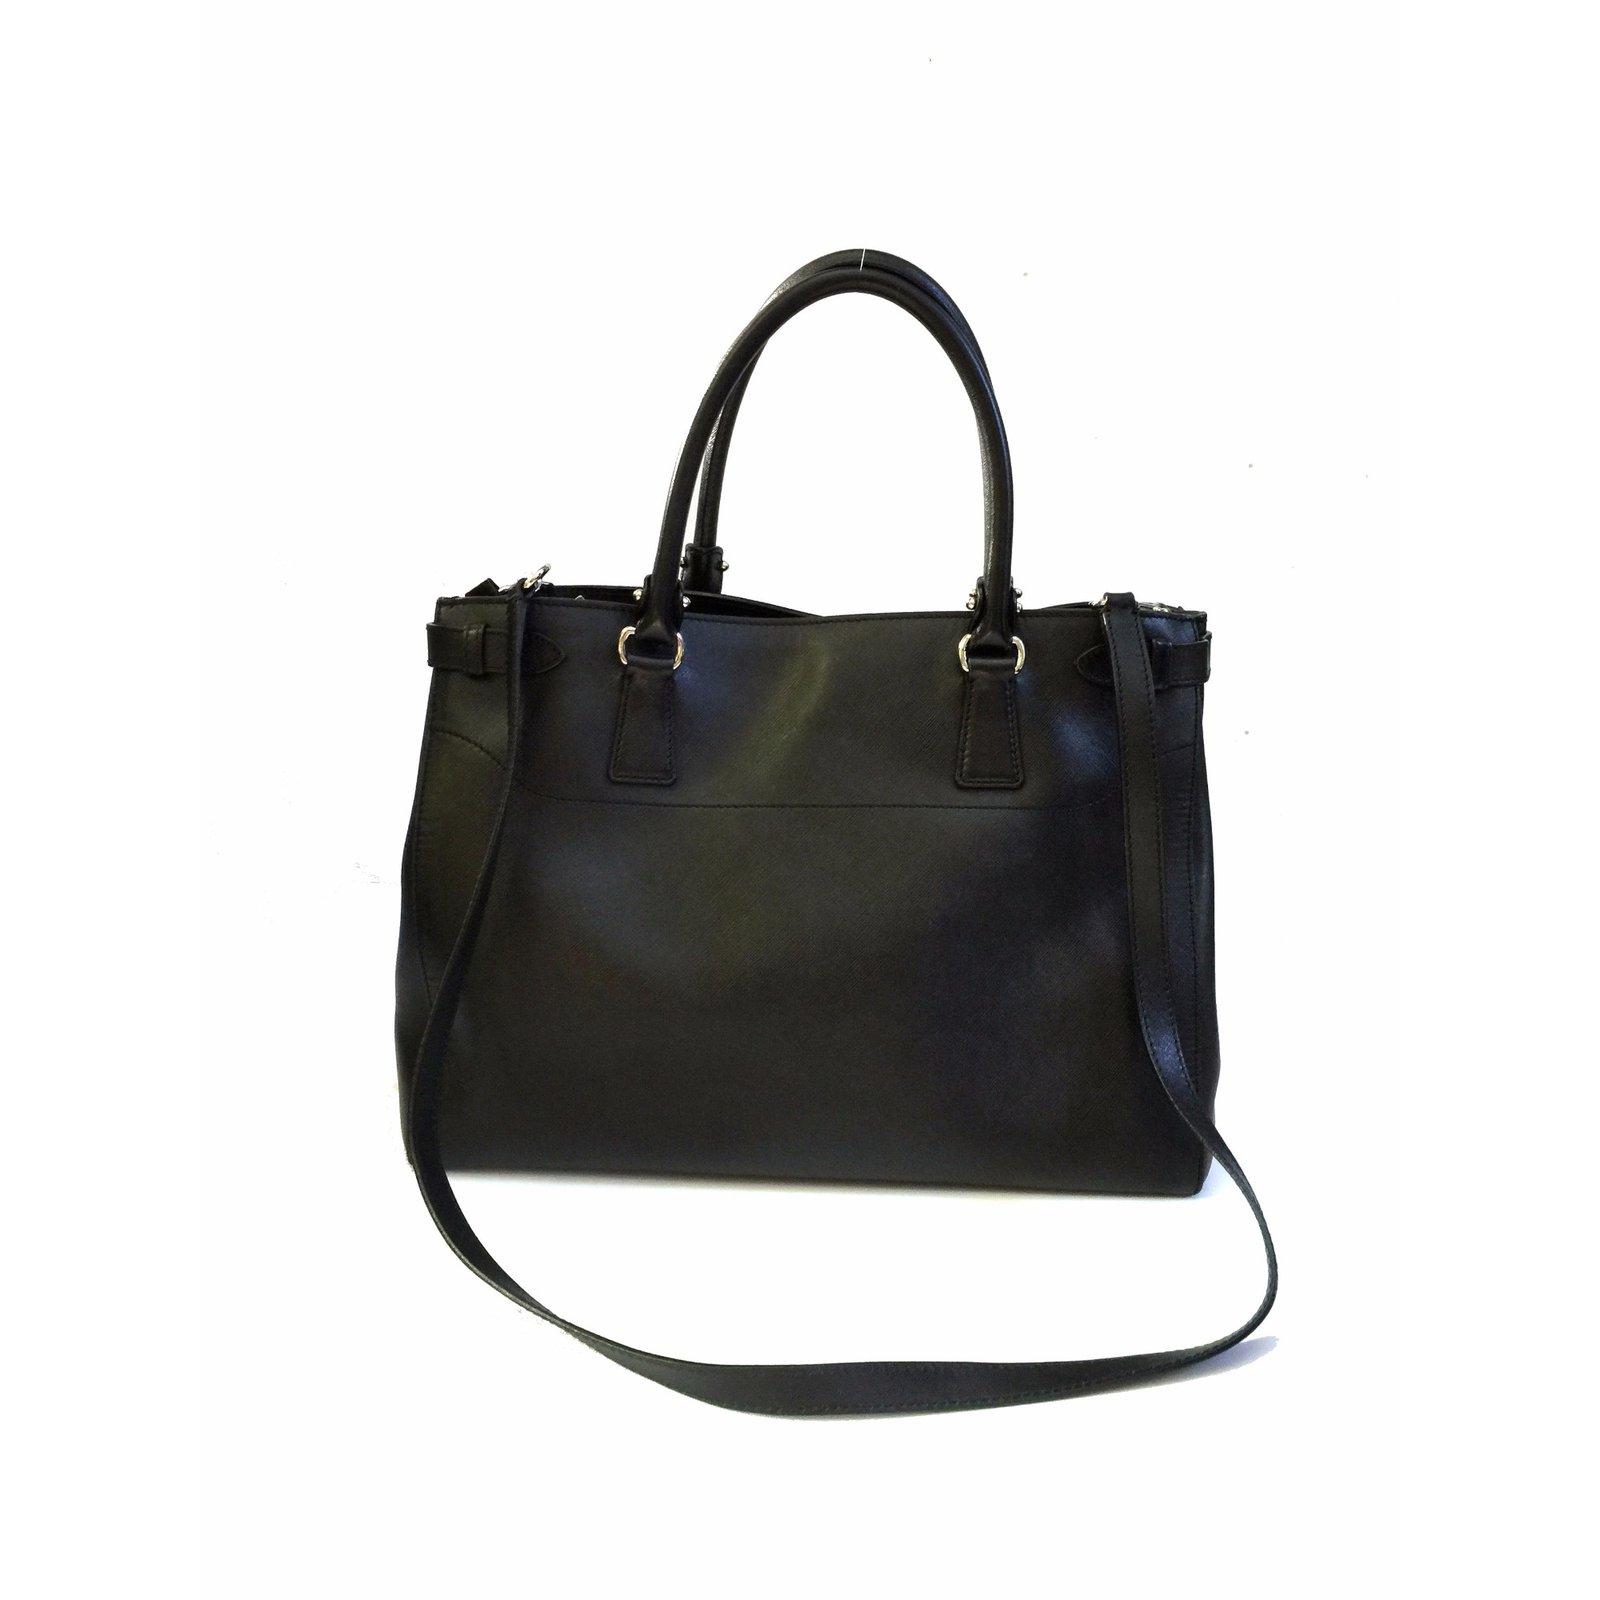 485367b4b752 Salvatore Ferragamo Batik Saffiano Tote (Large) Handbags Leather Black  ref.57152 - Joli Closet